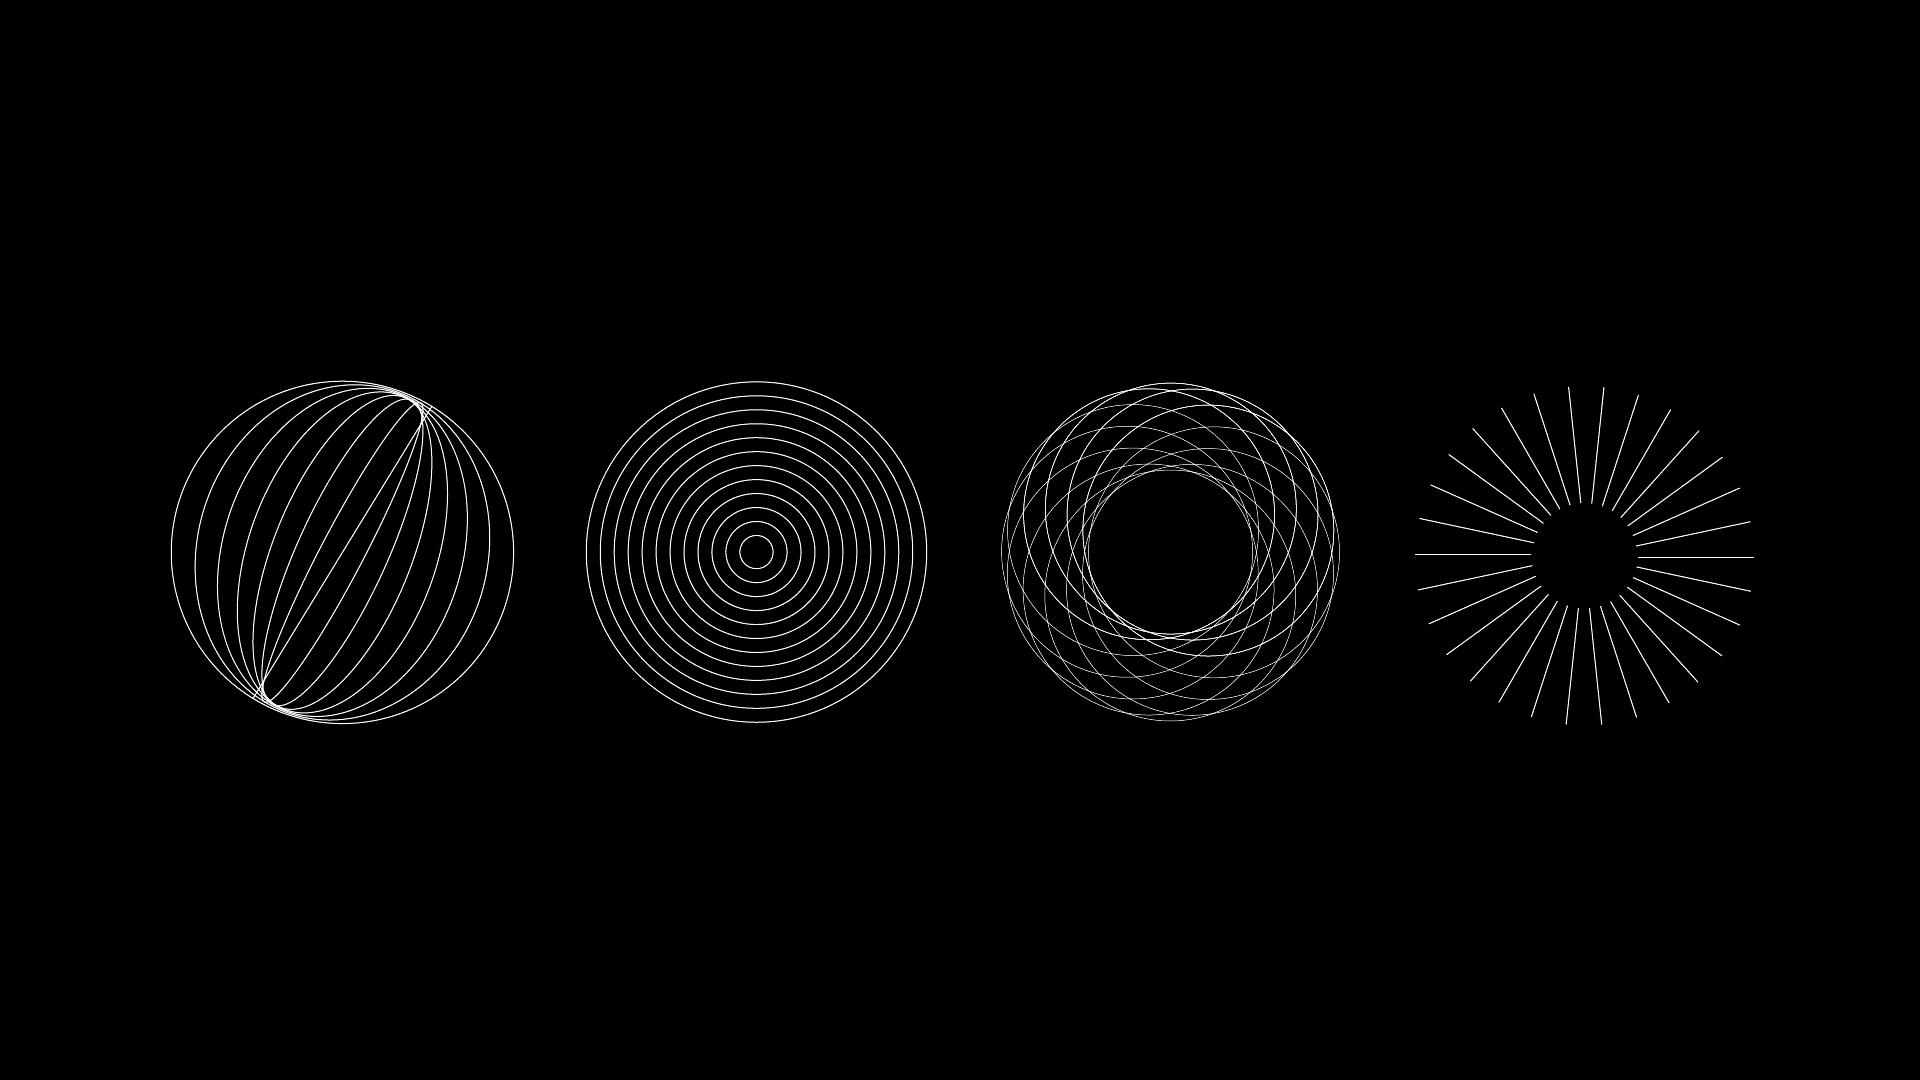 CIRCLES_4_fixed